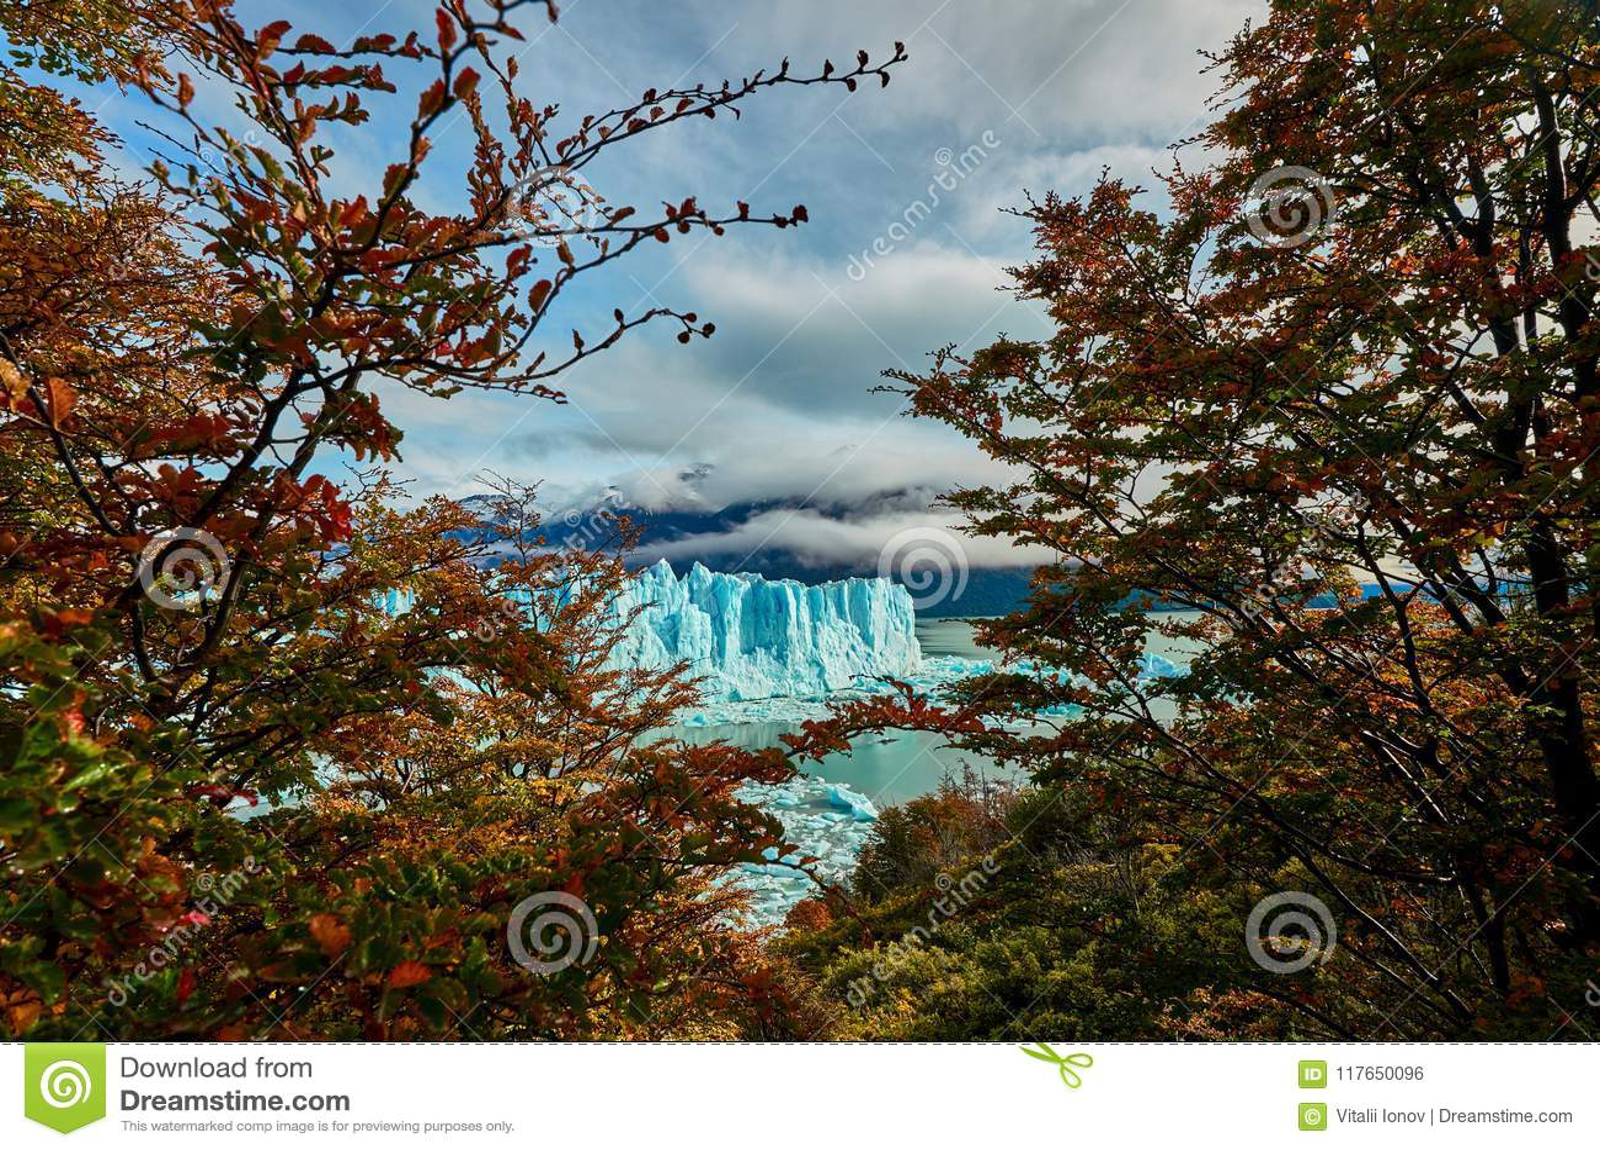 A view of the lake and glacier Perito Moreno national park Los Glaciares. The Argentine Patagonia in Autumn.